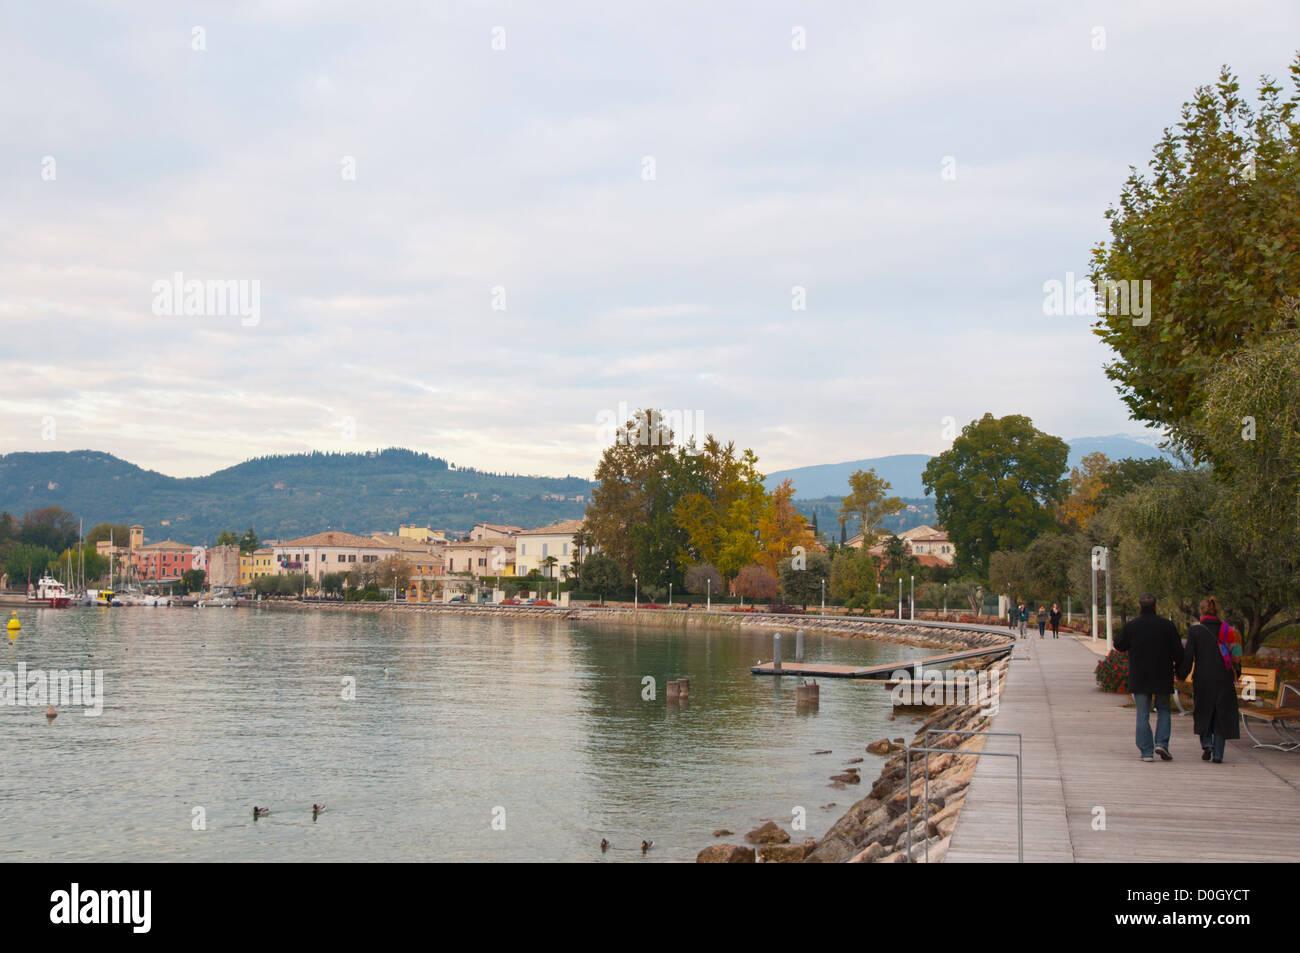 Bardelino town Lago di Garda the Garda Lake the Veneto region Italy Europe Stock Photo